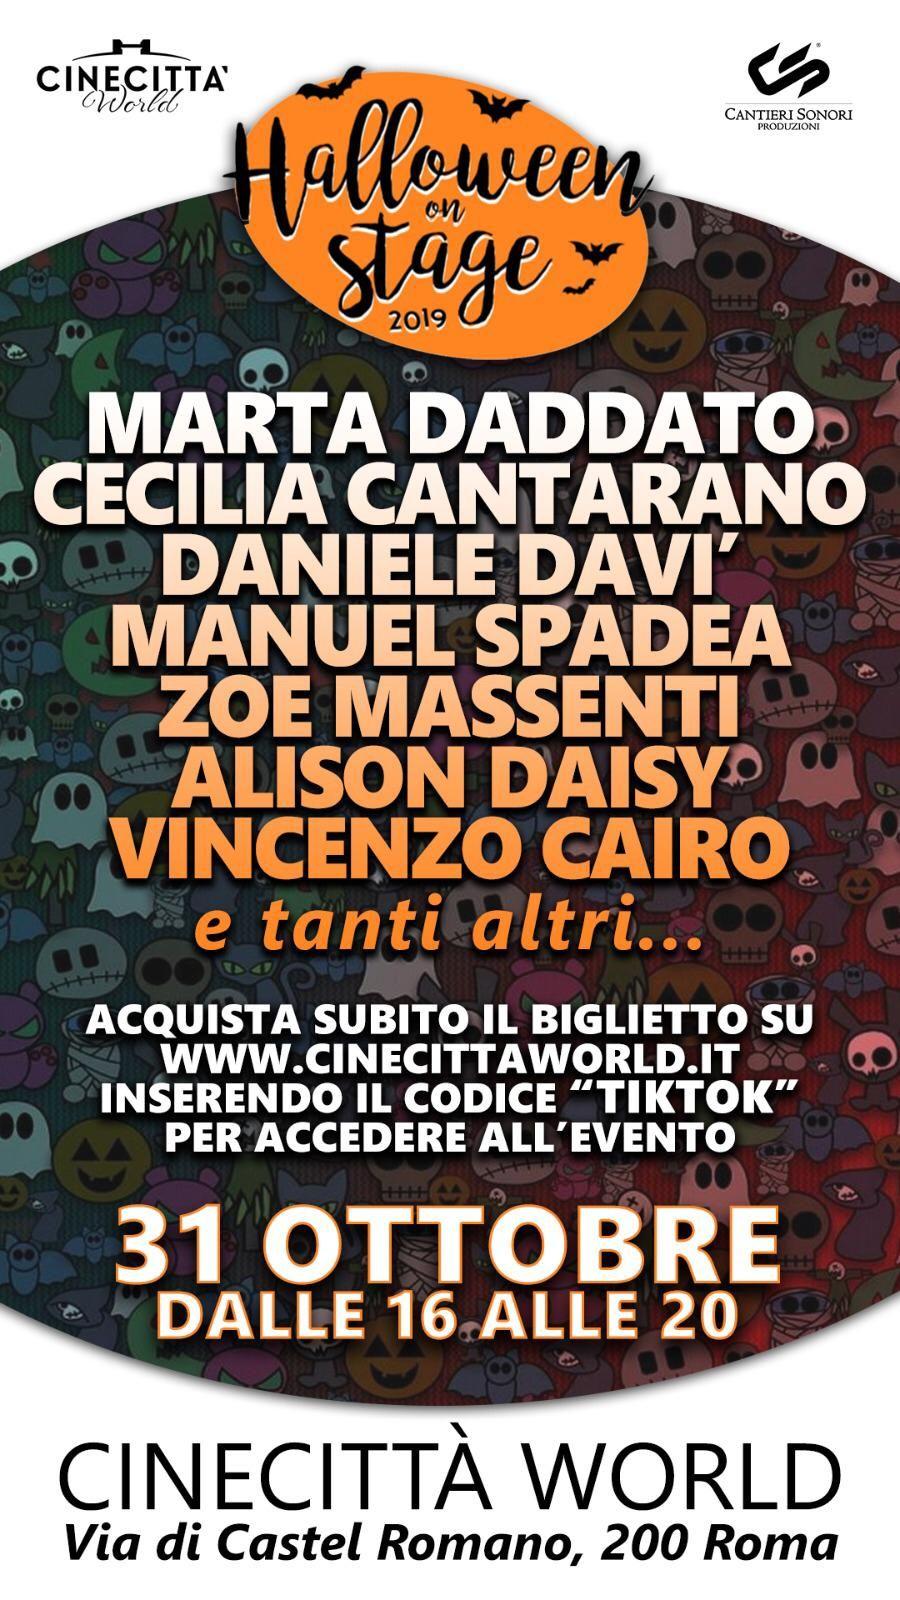 Halloween 2019: Cecilia Cantarano e Marta Daddato da Tik Tok a Cinecittà World